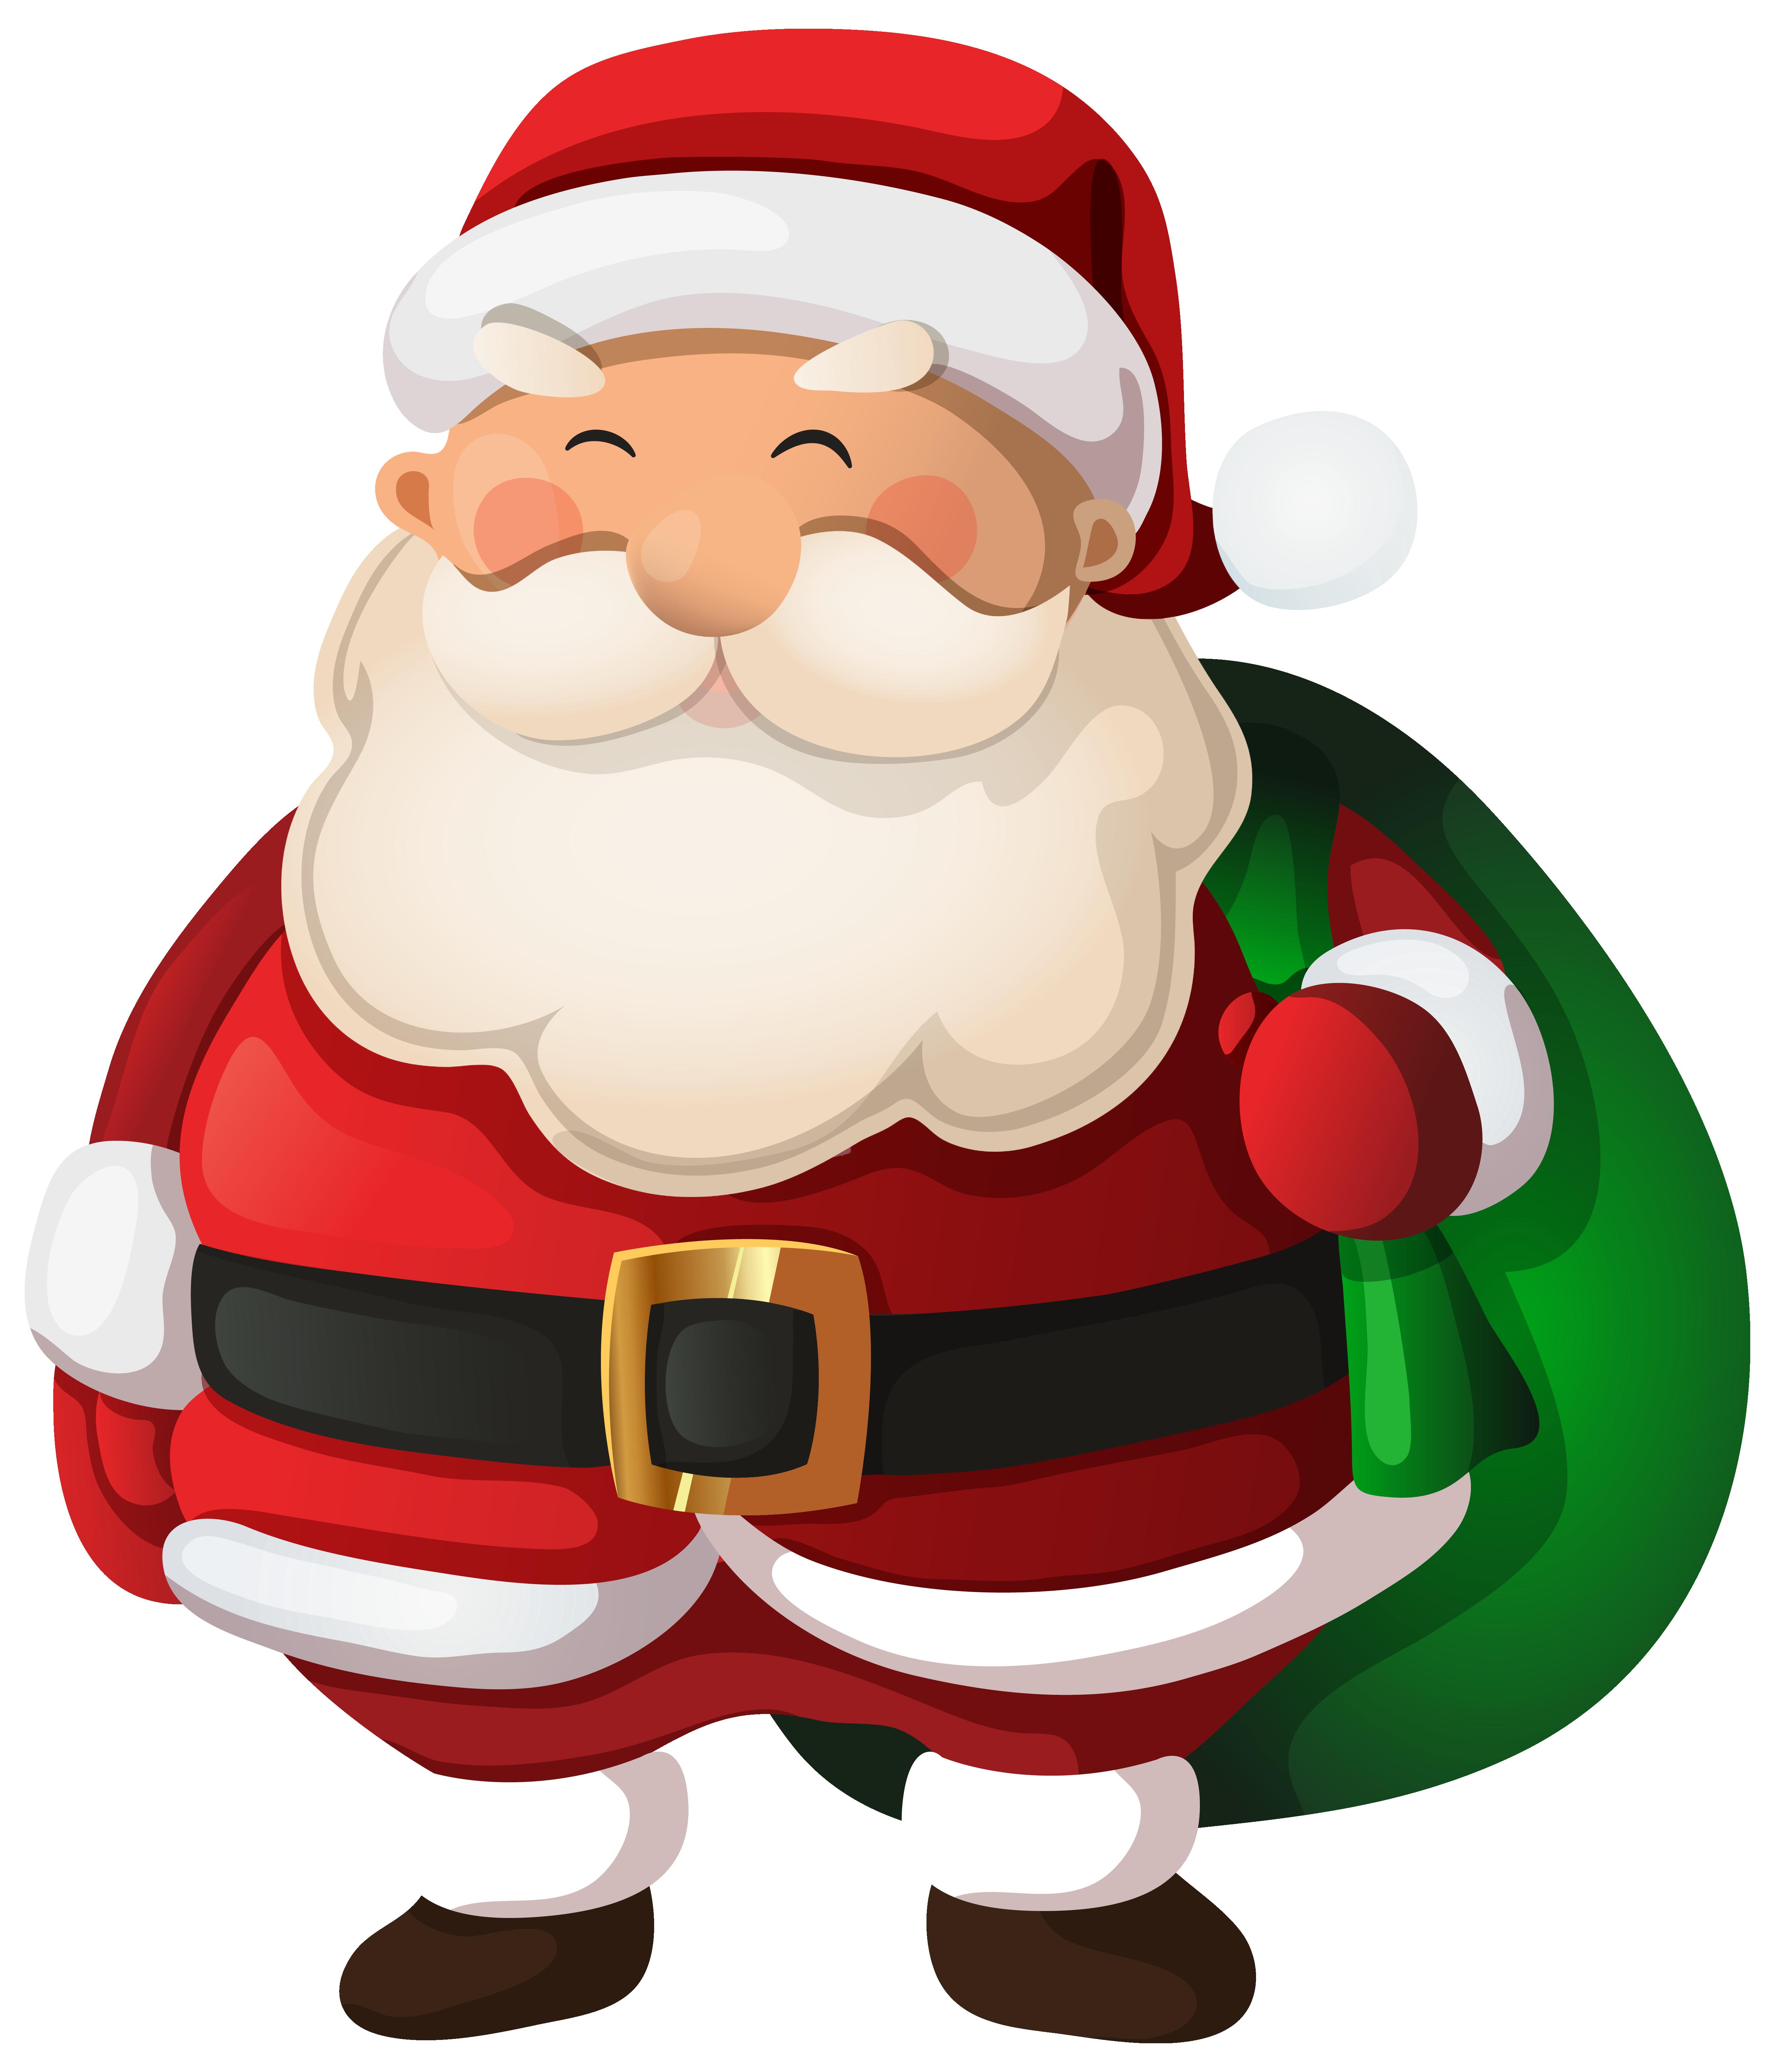 top 73 santa claus clip art best clipart blog christmas ideas rh pinterest com free clipart of santa claus free clipart of santa claus